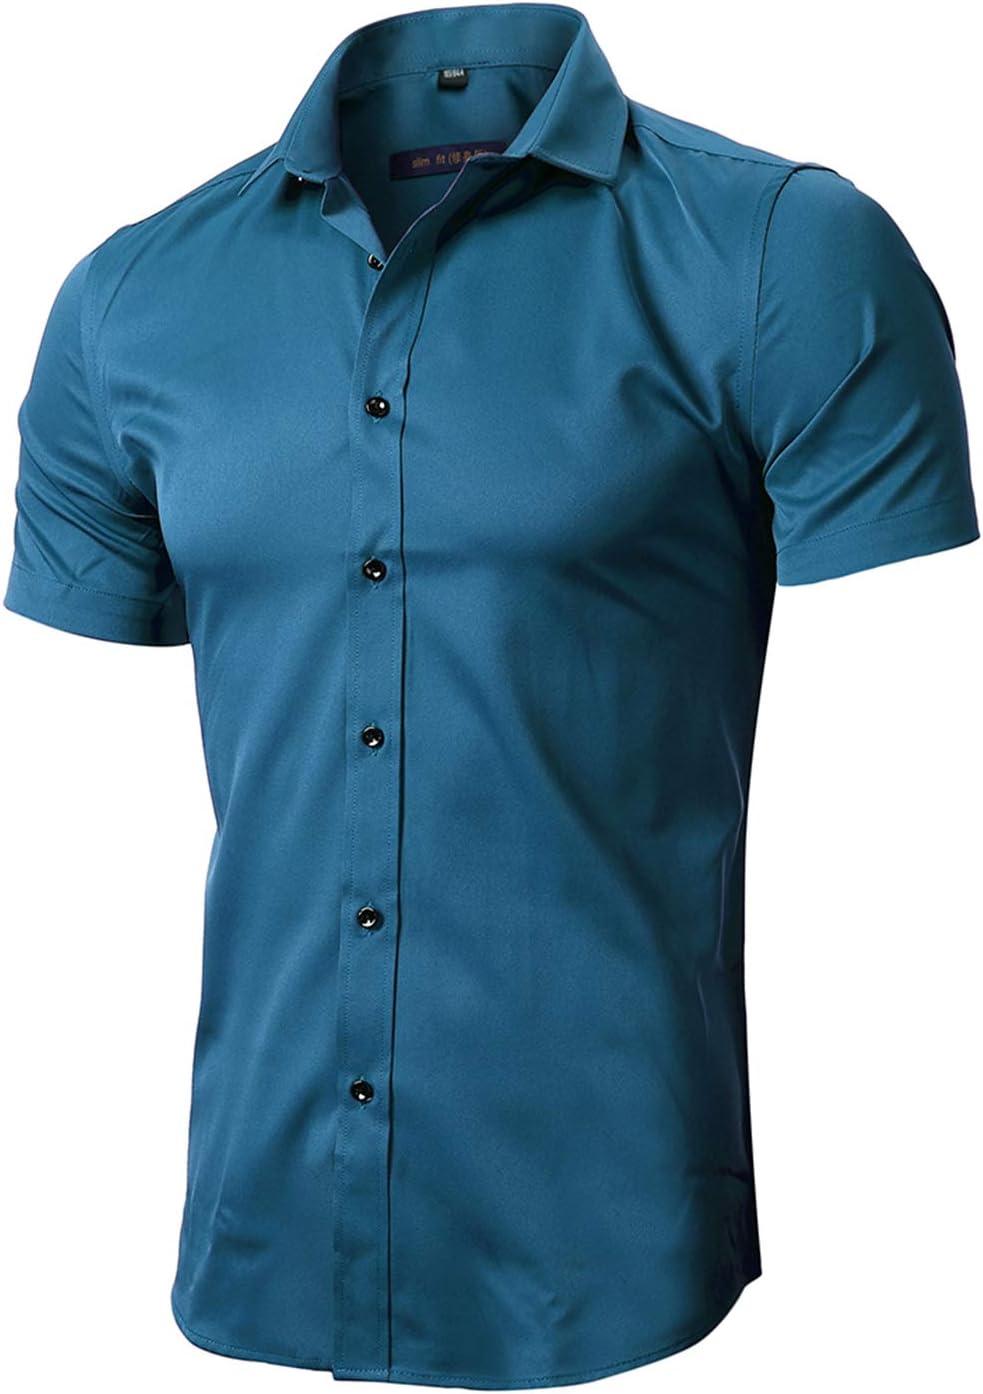 Esast Men Dress Shirts Bamboo Fiber Short Sleeve Casual Button Down Shirts Formal Shirts